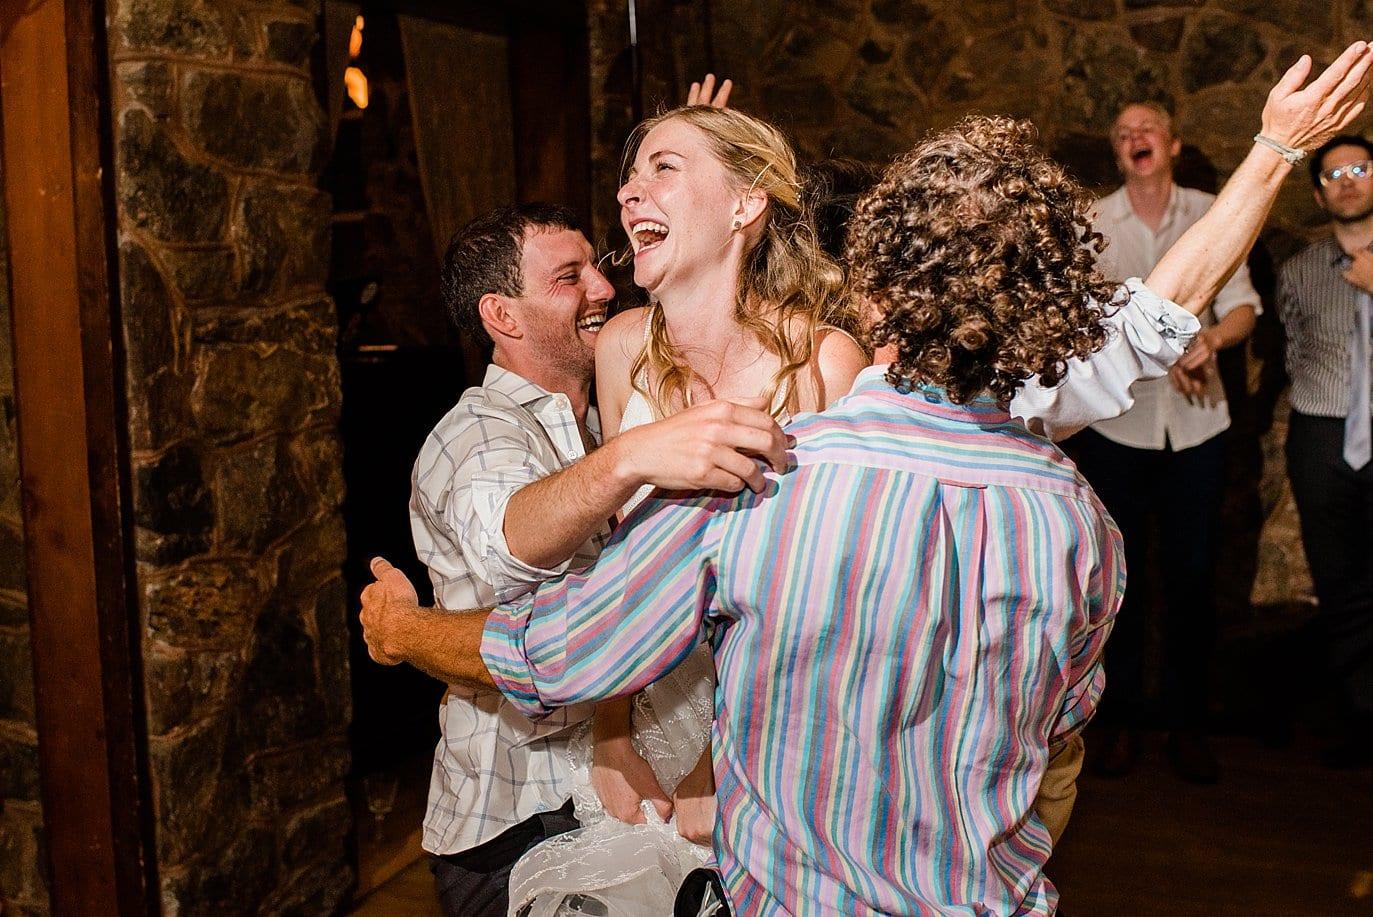 bride group hug on dance floor of intimate wedding